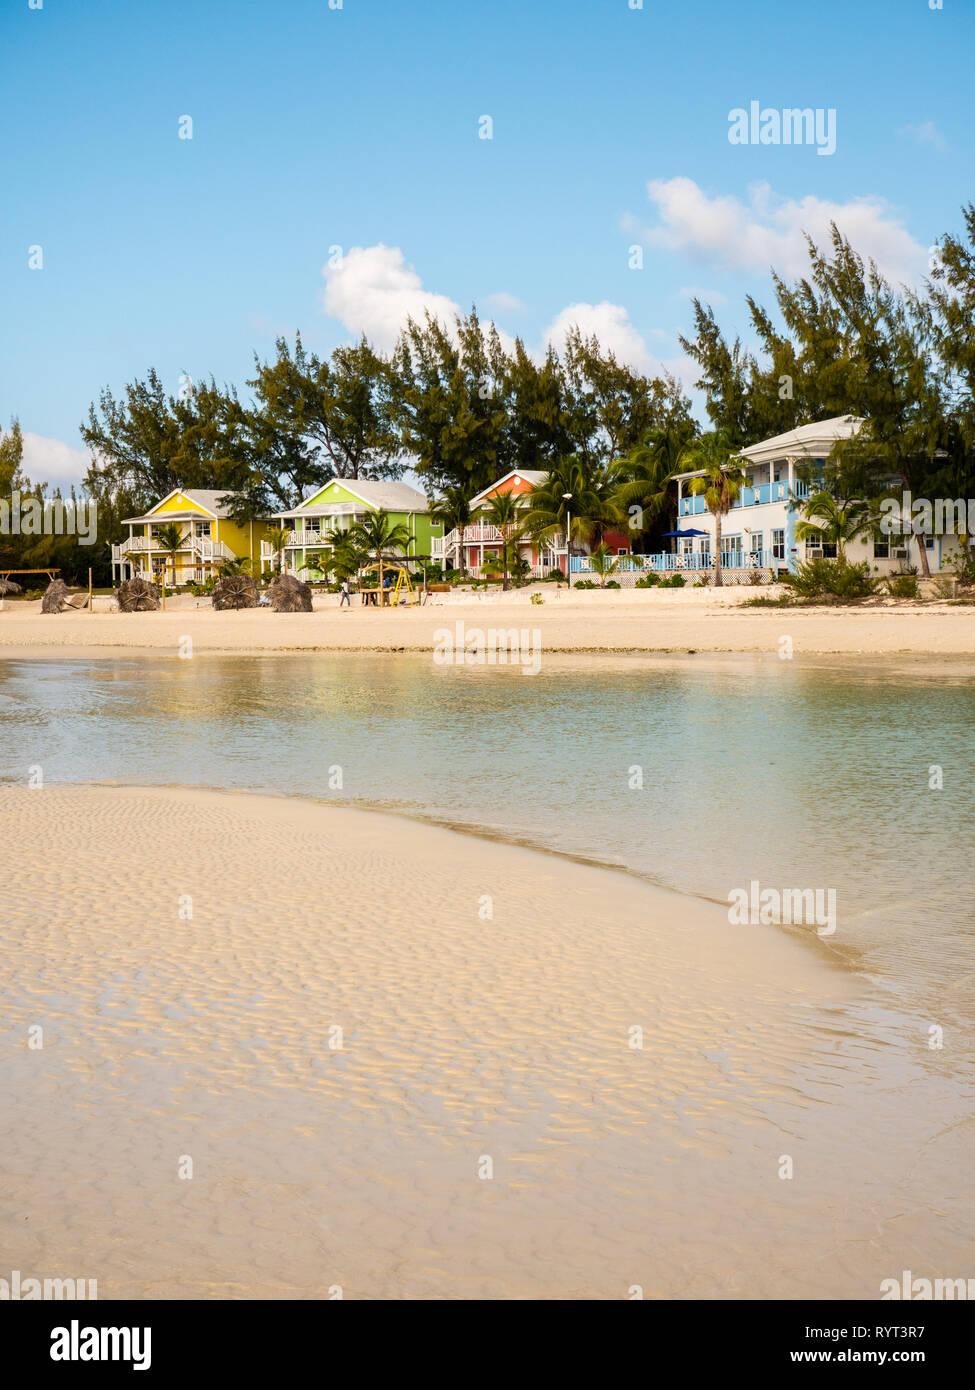 Cocodimama Charming Resort, Governors Harbour, Eleuthera Island, The Bahamas, The Caribbean. - Stock Image